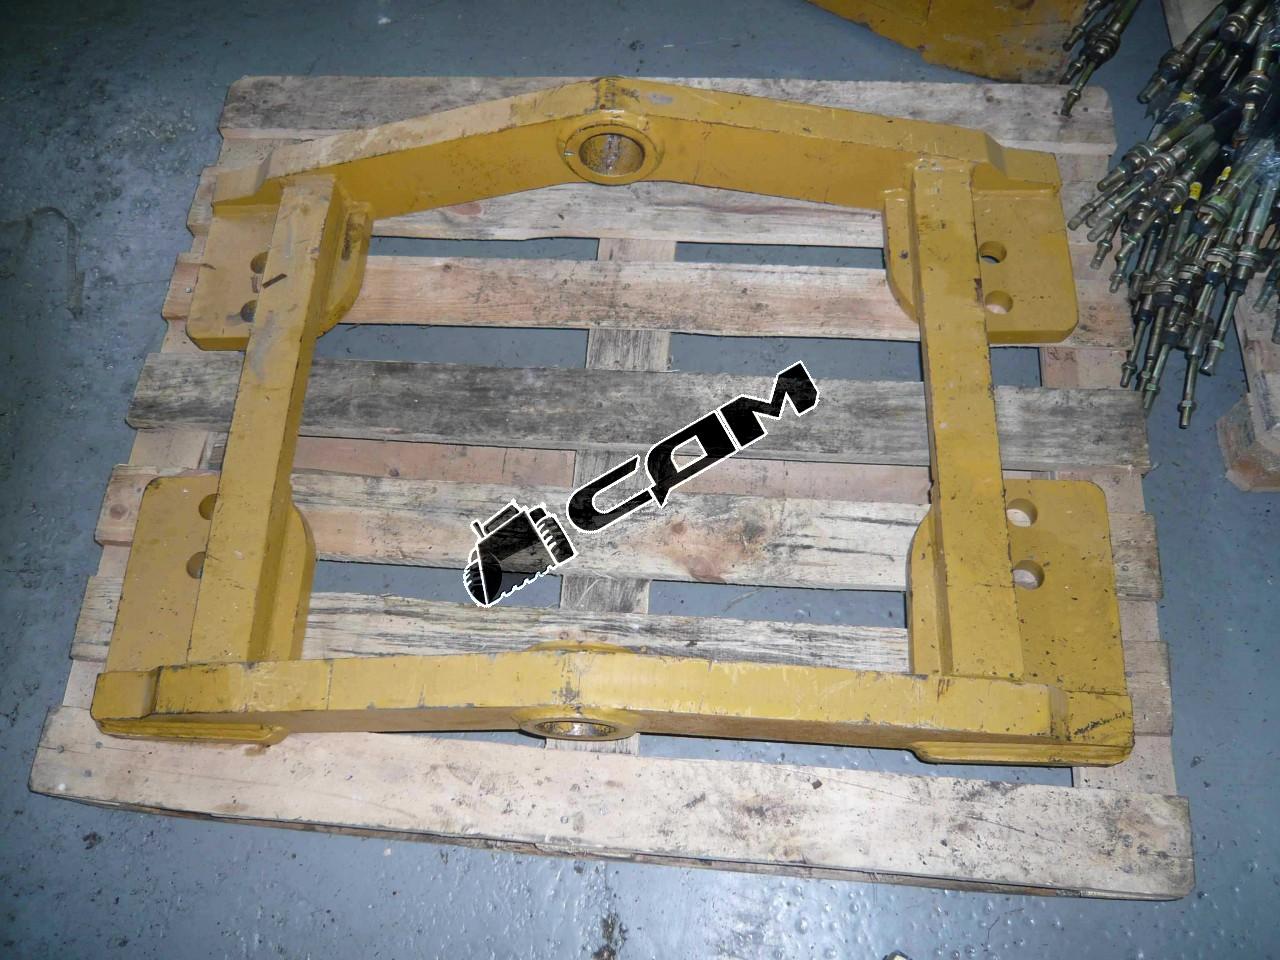 Балансир заднего моста CDM855 (осцилятор) LG50F.10300B LG855.10.03